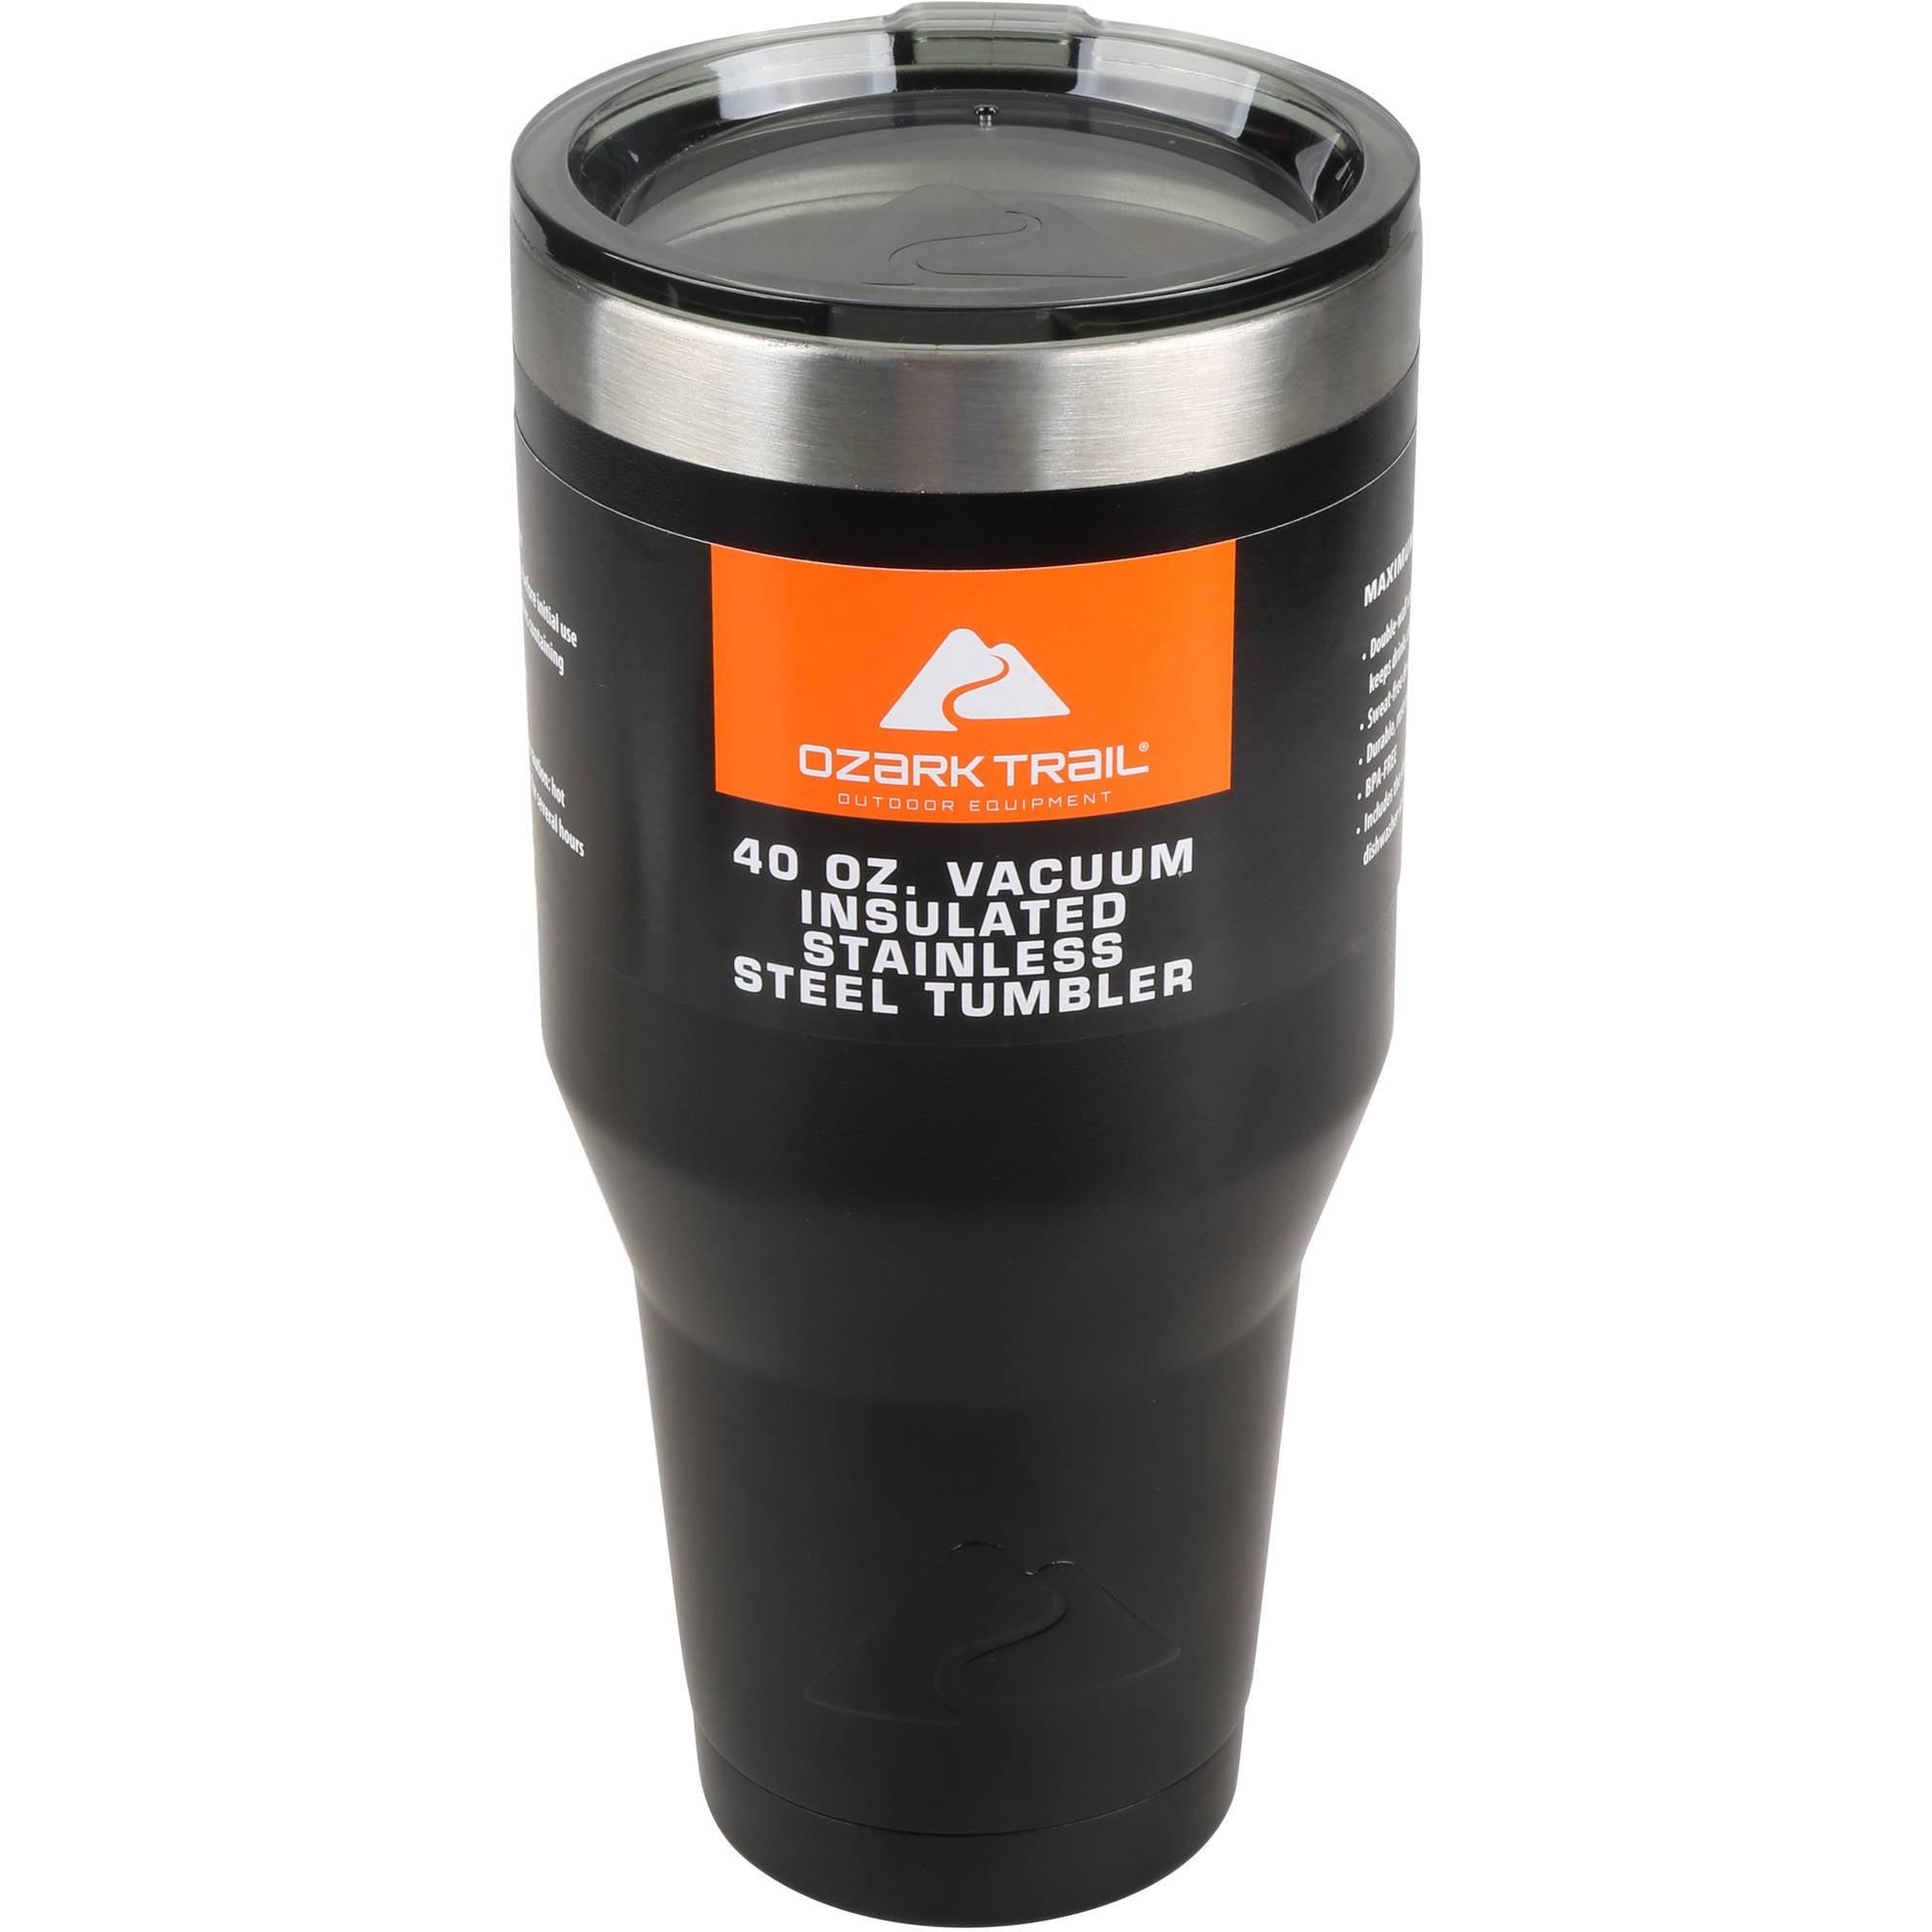 Ozark Trail 40 oz Vacuum Insulated Stainless Steel Tumbler ...